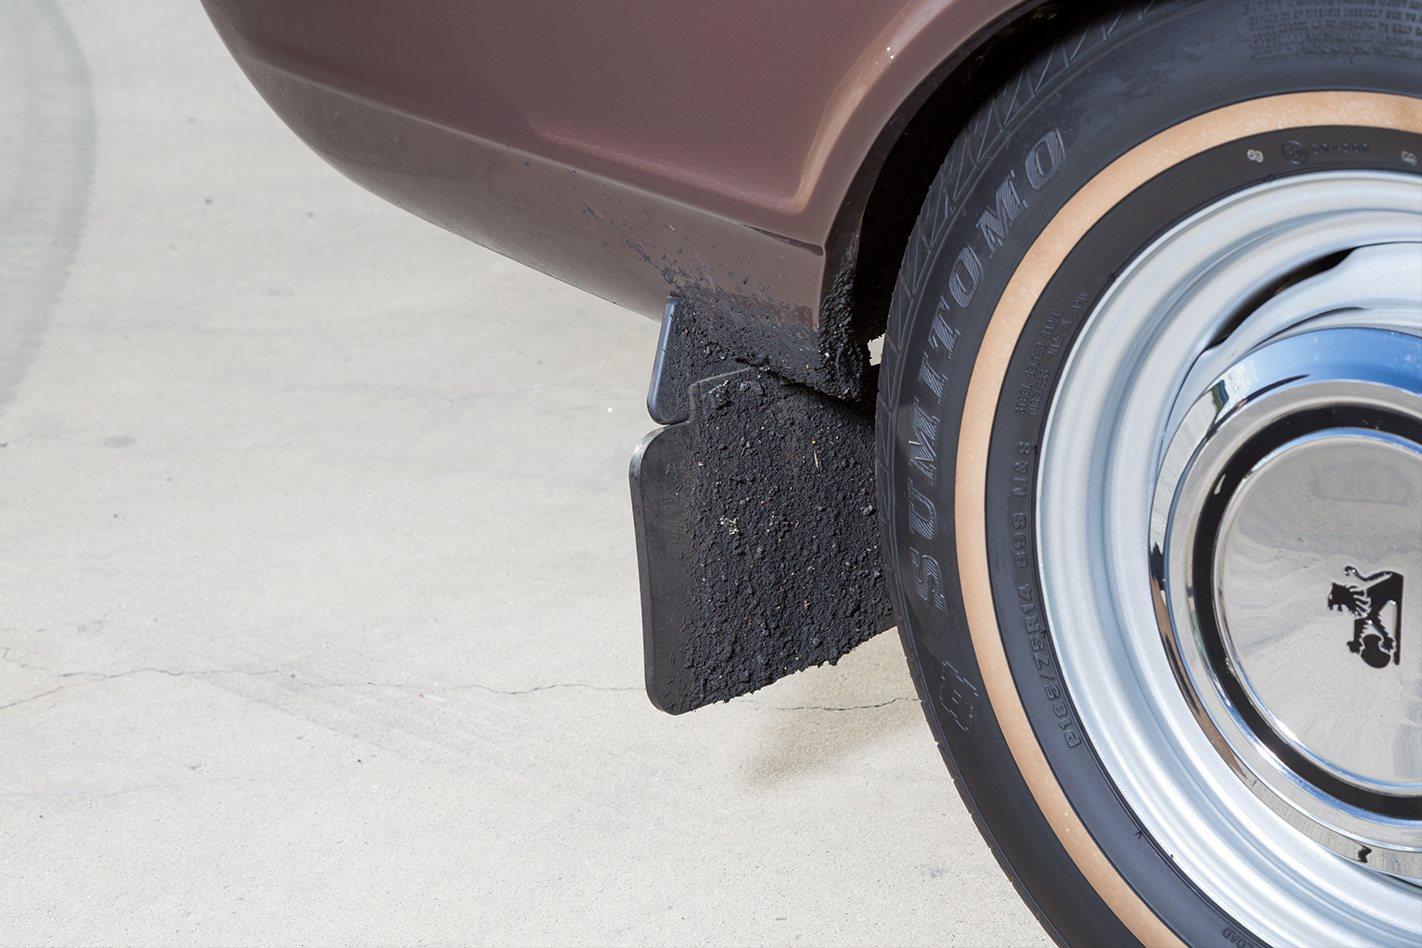 Holden LJ Torana hubcaps